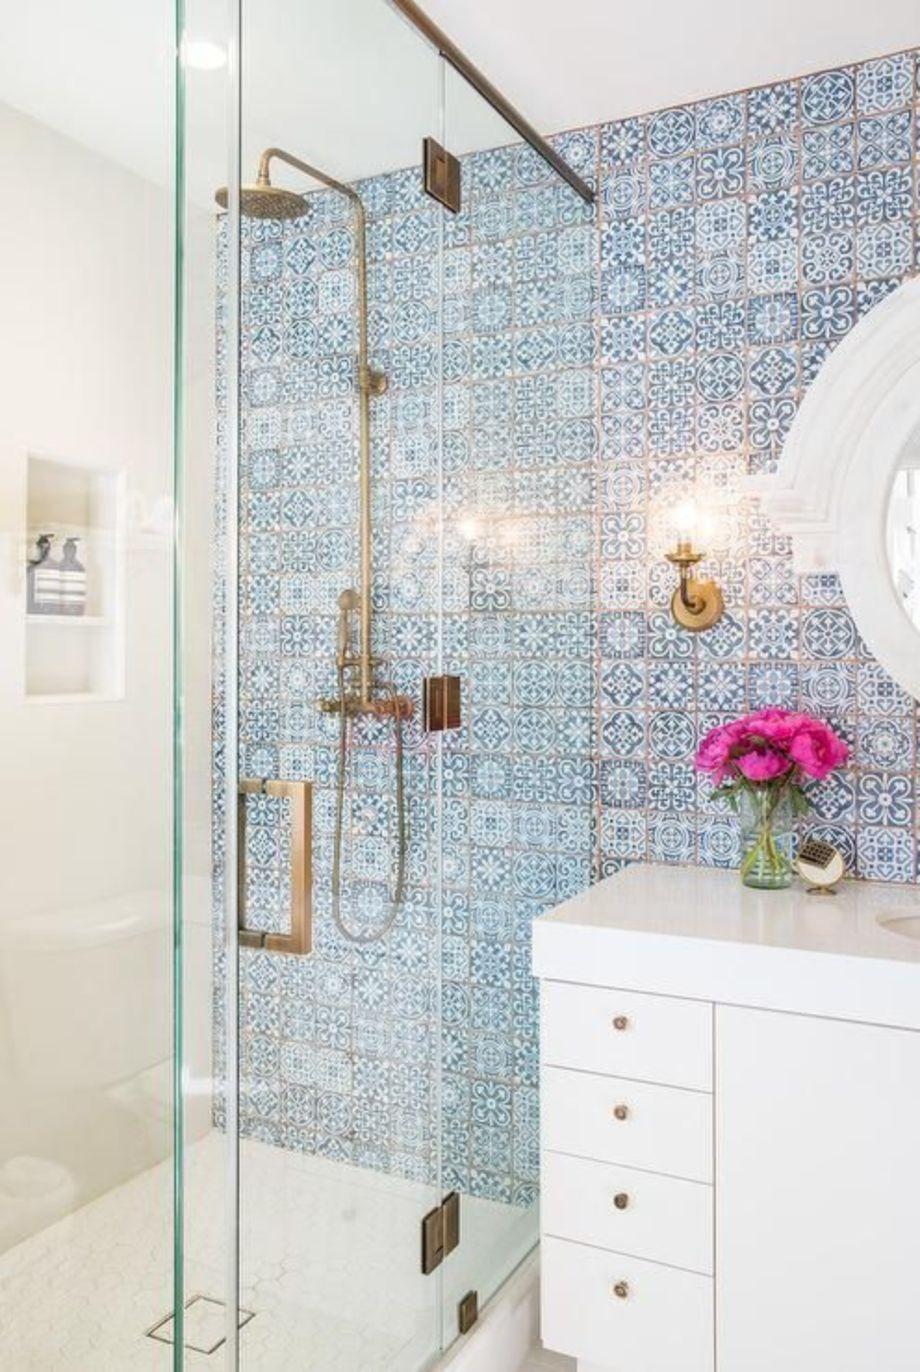 120 Modern Small Bathroom Tile Ideas  Small Bathroom Tiles Adorable Modern Small Bathroom Decorating Design